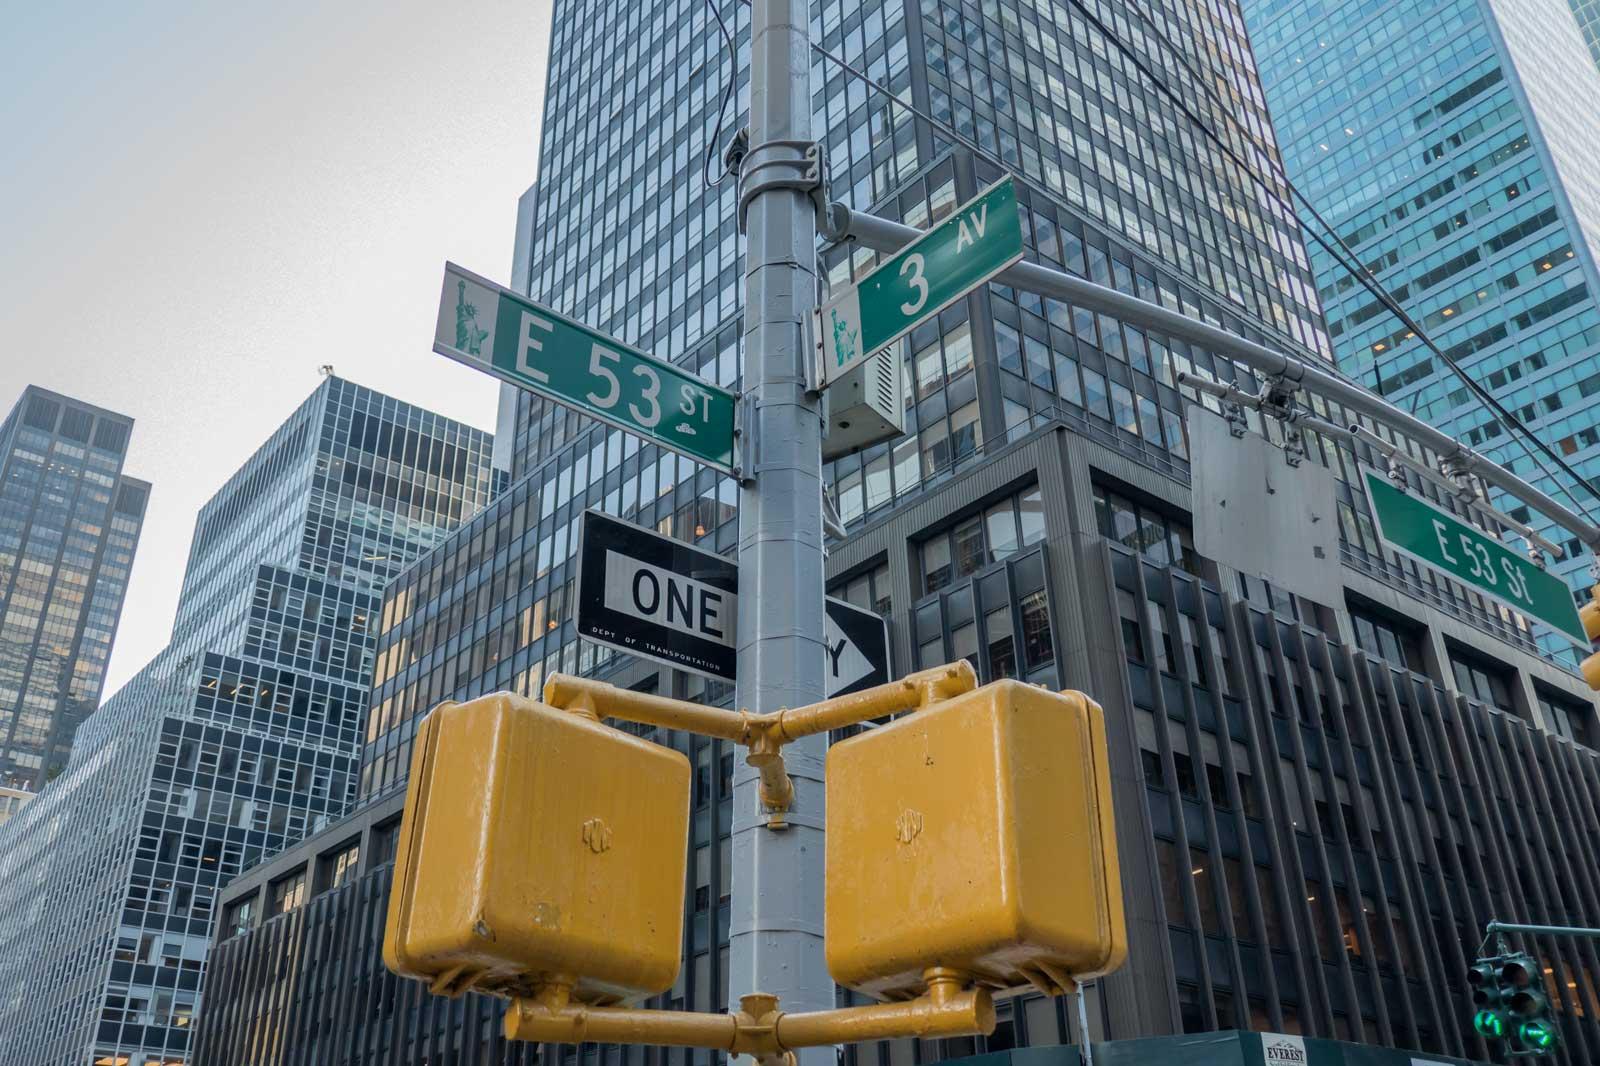 53rd & 3rd The Ramones New York City